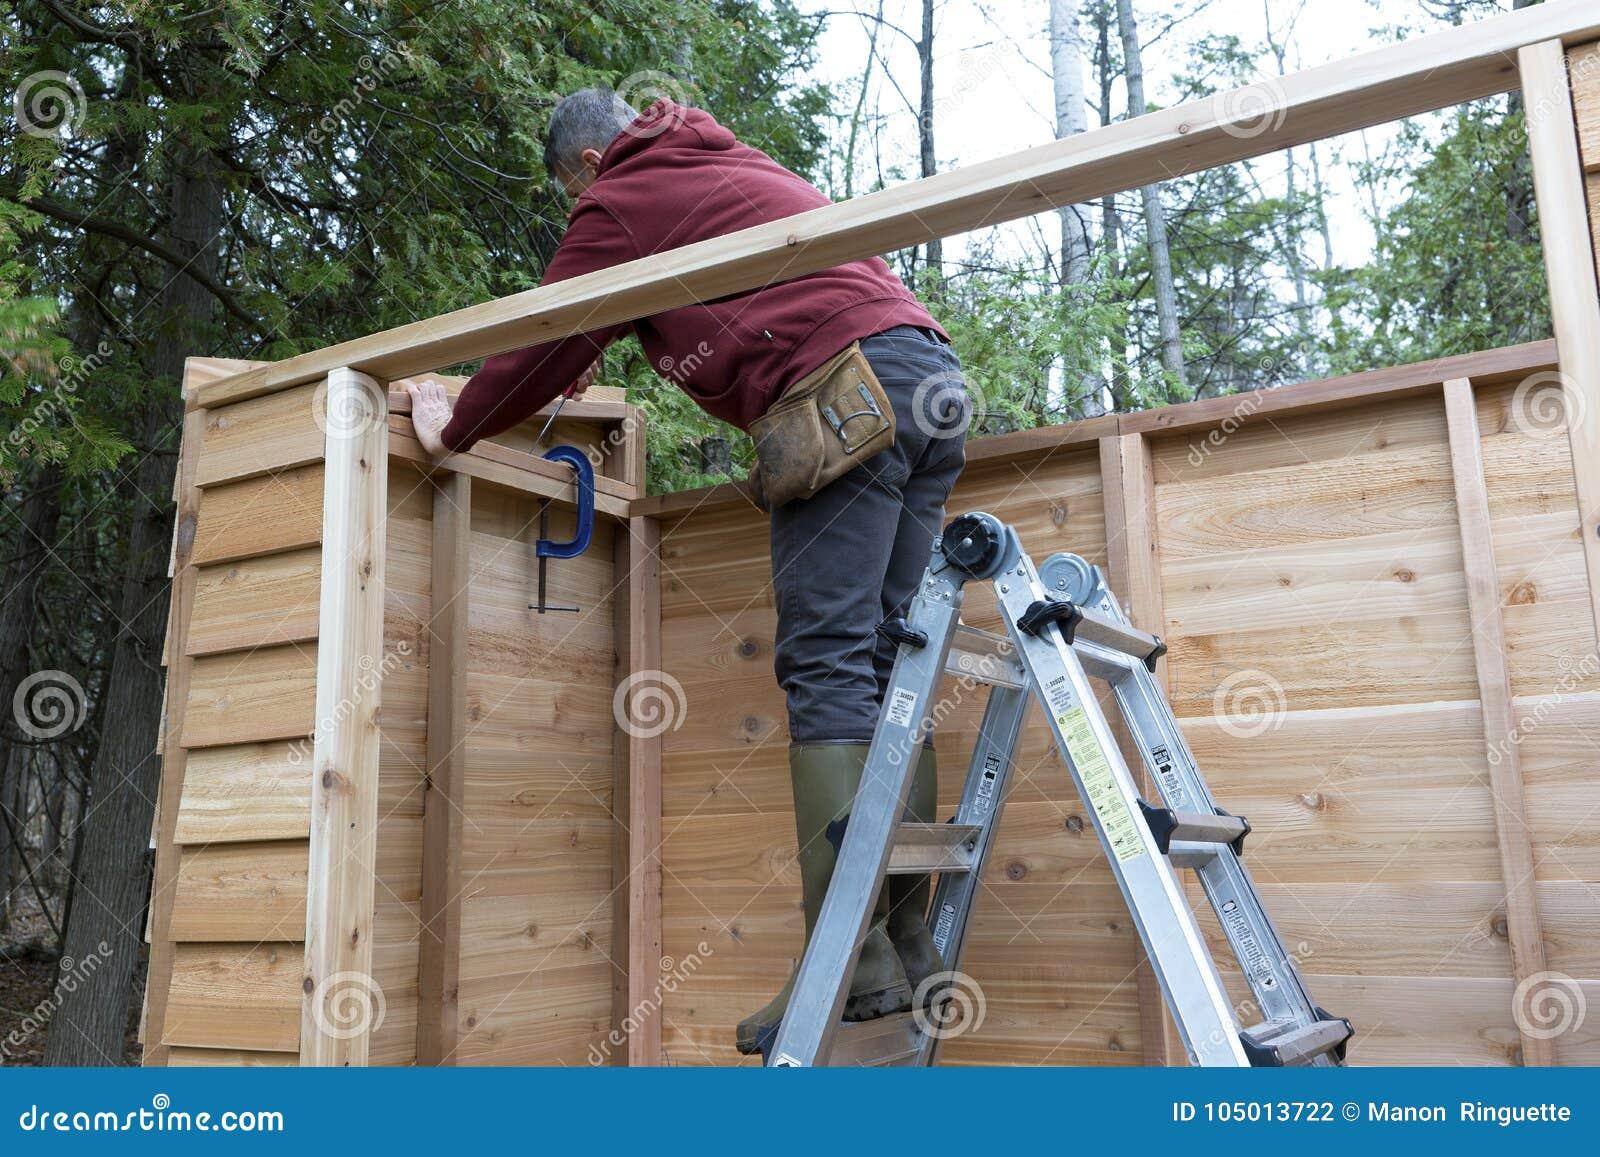 Handyman Building A Cedar Storage Shed Stock Photo - Image